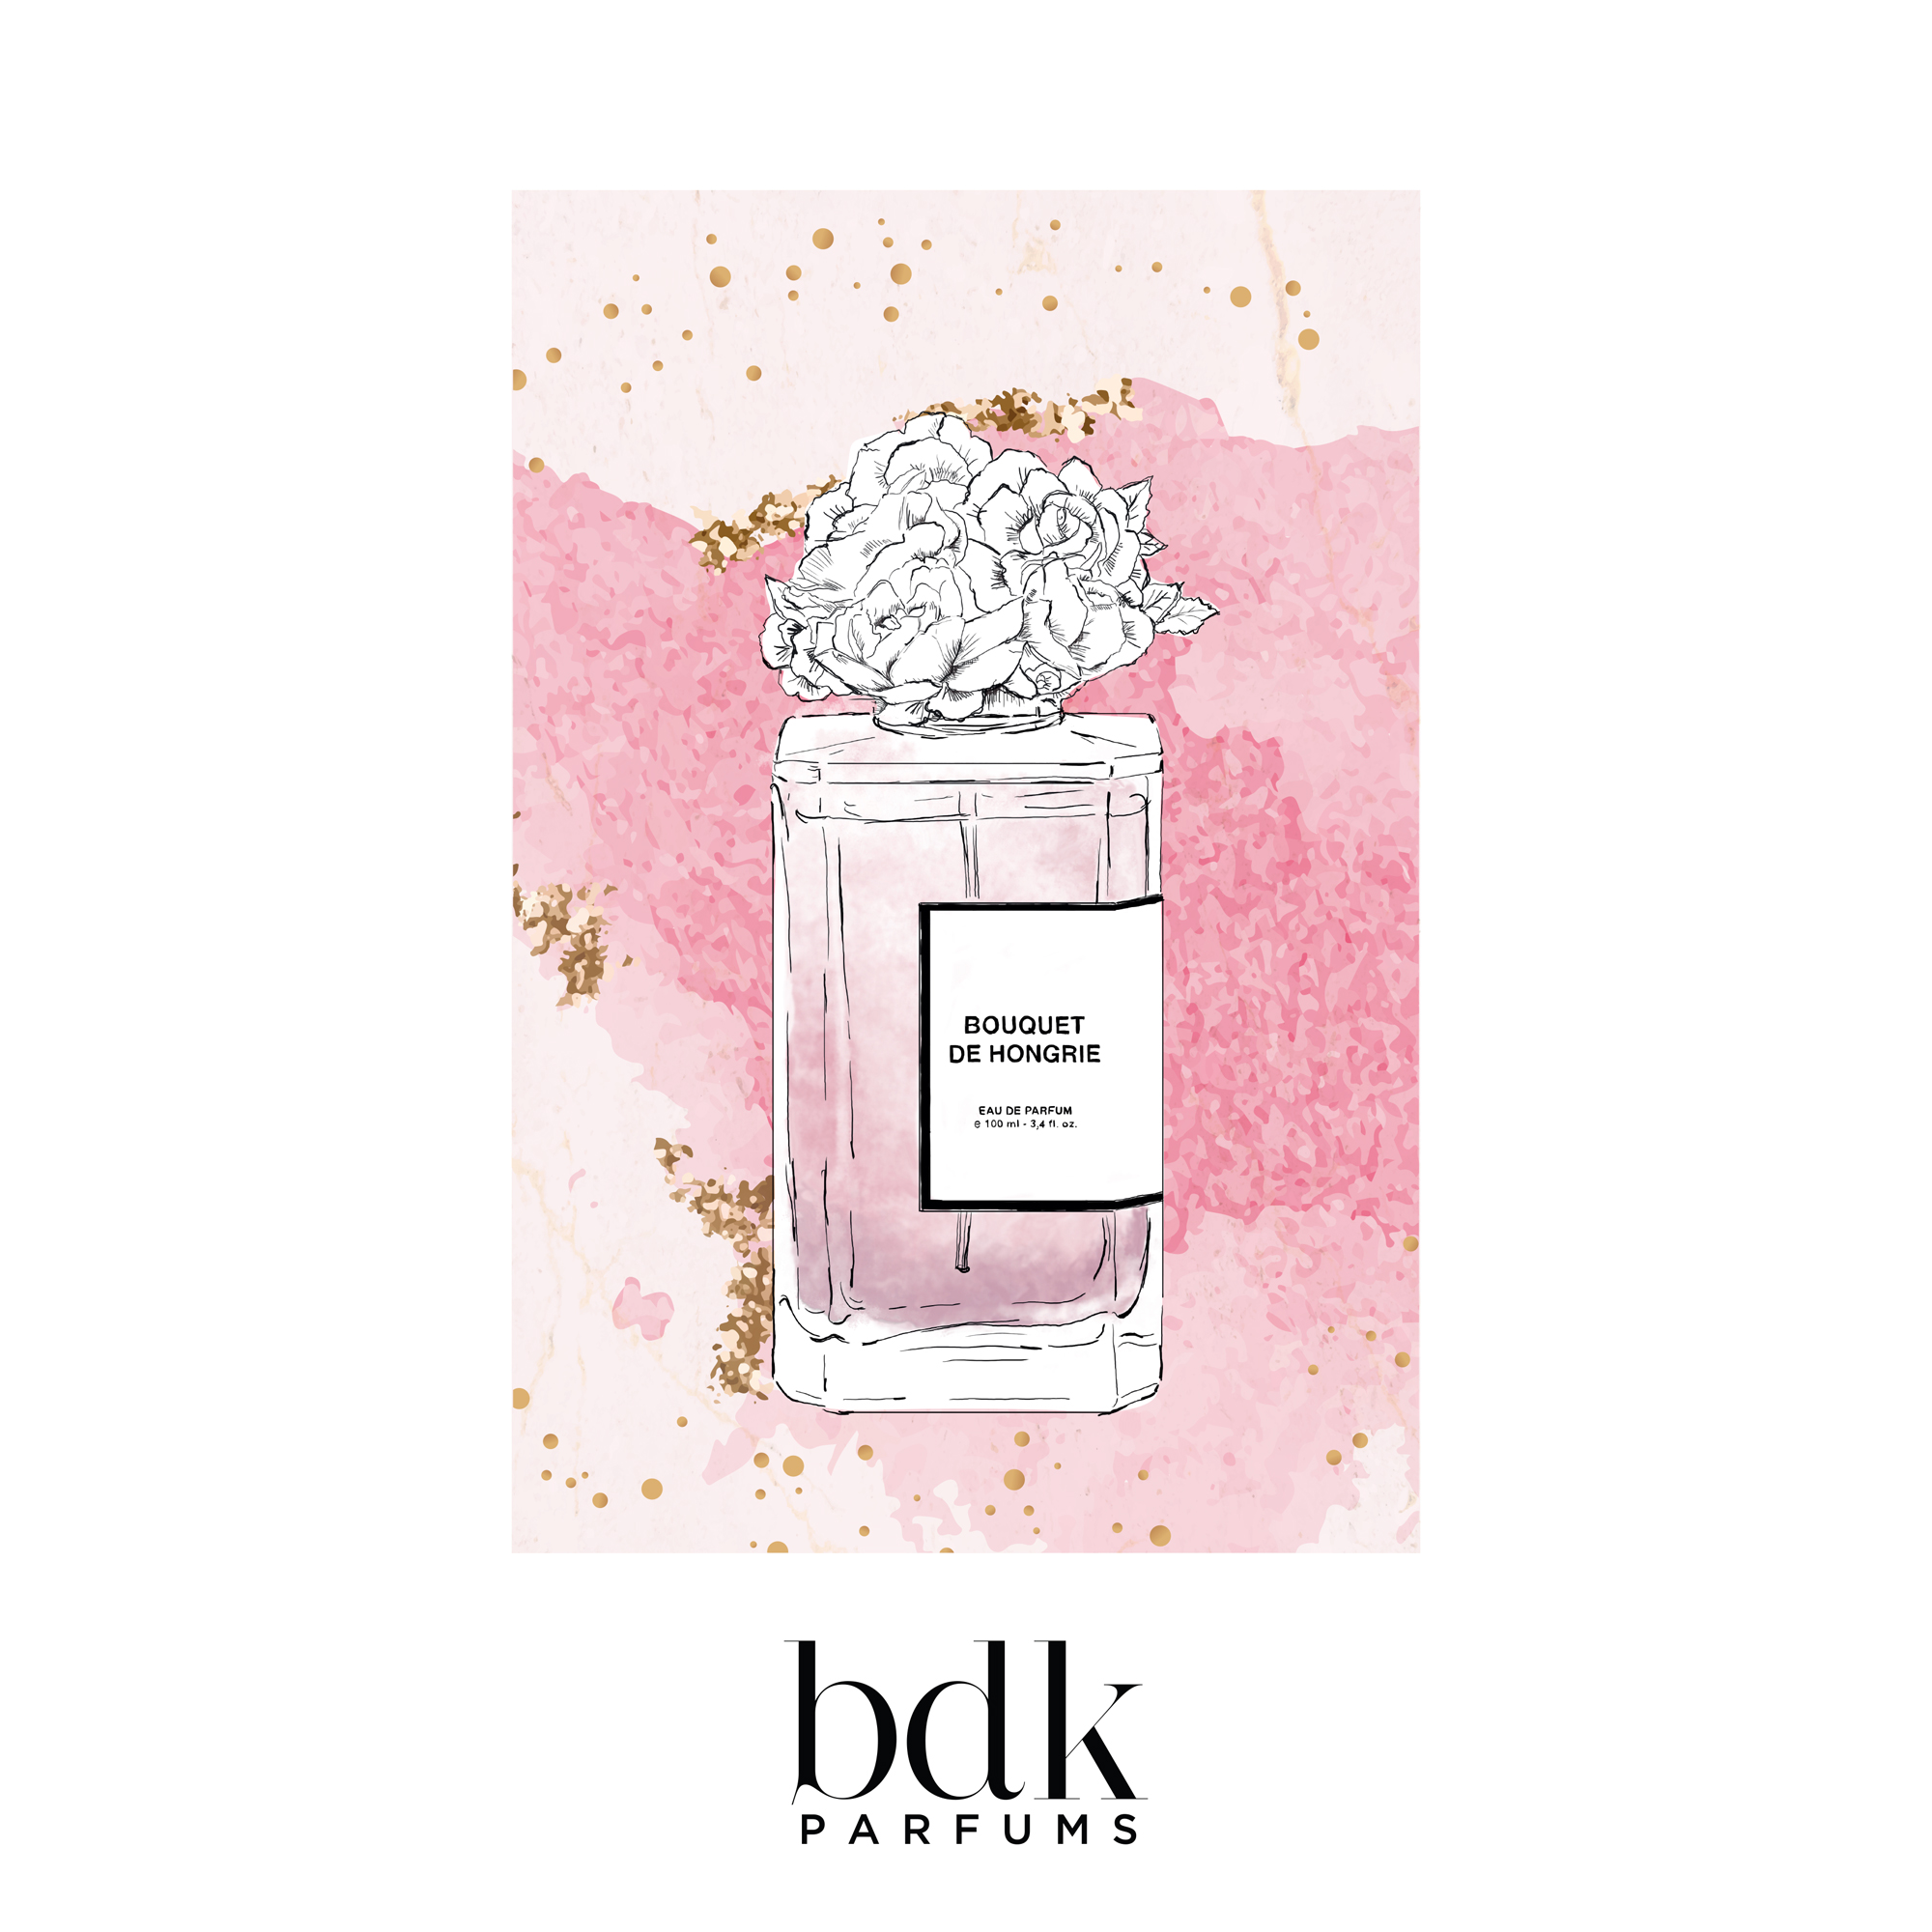 Centri-Ottici-BELOTTI-OtticaUdito-BDK-Parfums-3